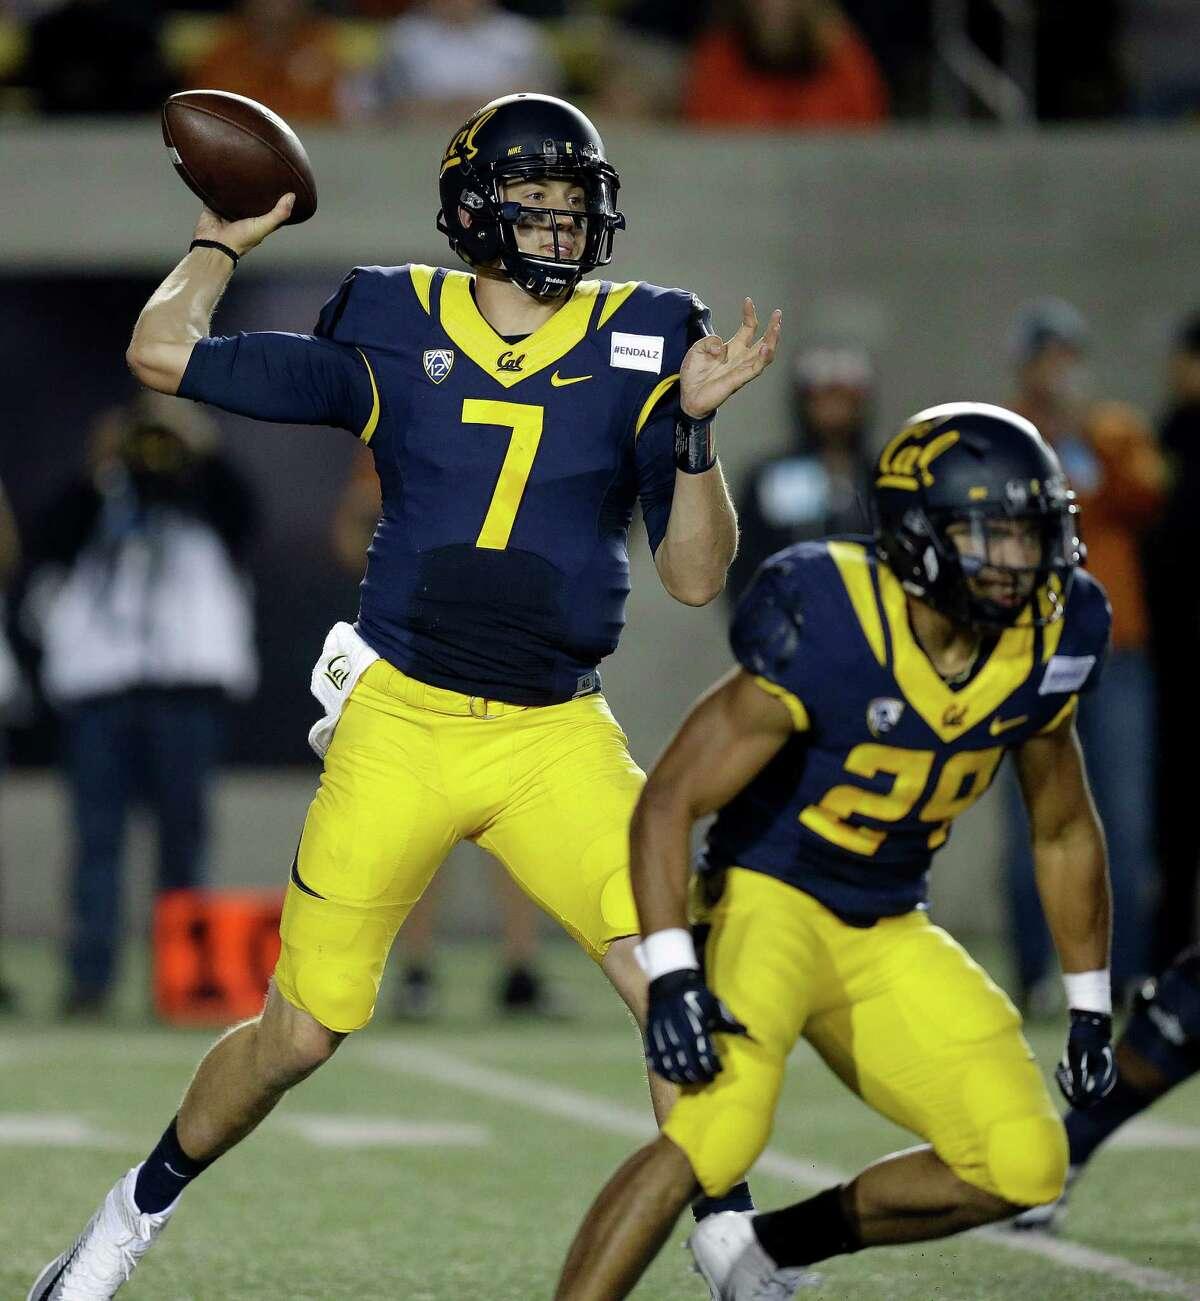 California quarterback Davis Webb (7) passes against Texas during the second half of an NCAA college football game Saturday, Sept. 17, 2016, in Berkeley, Calif. California won, 50-43. (AP Photo/Ben Margot)